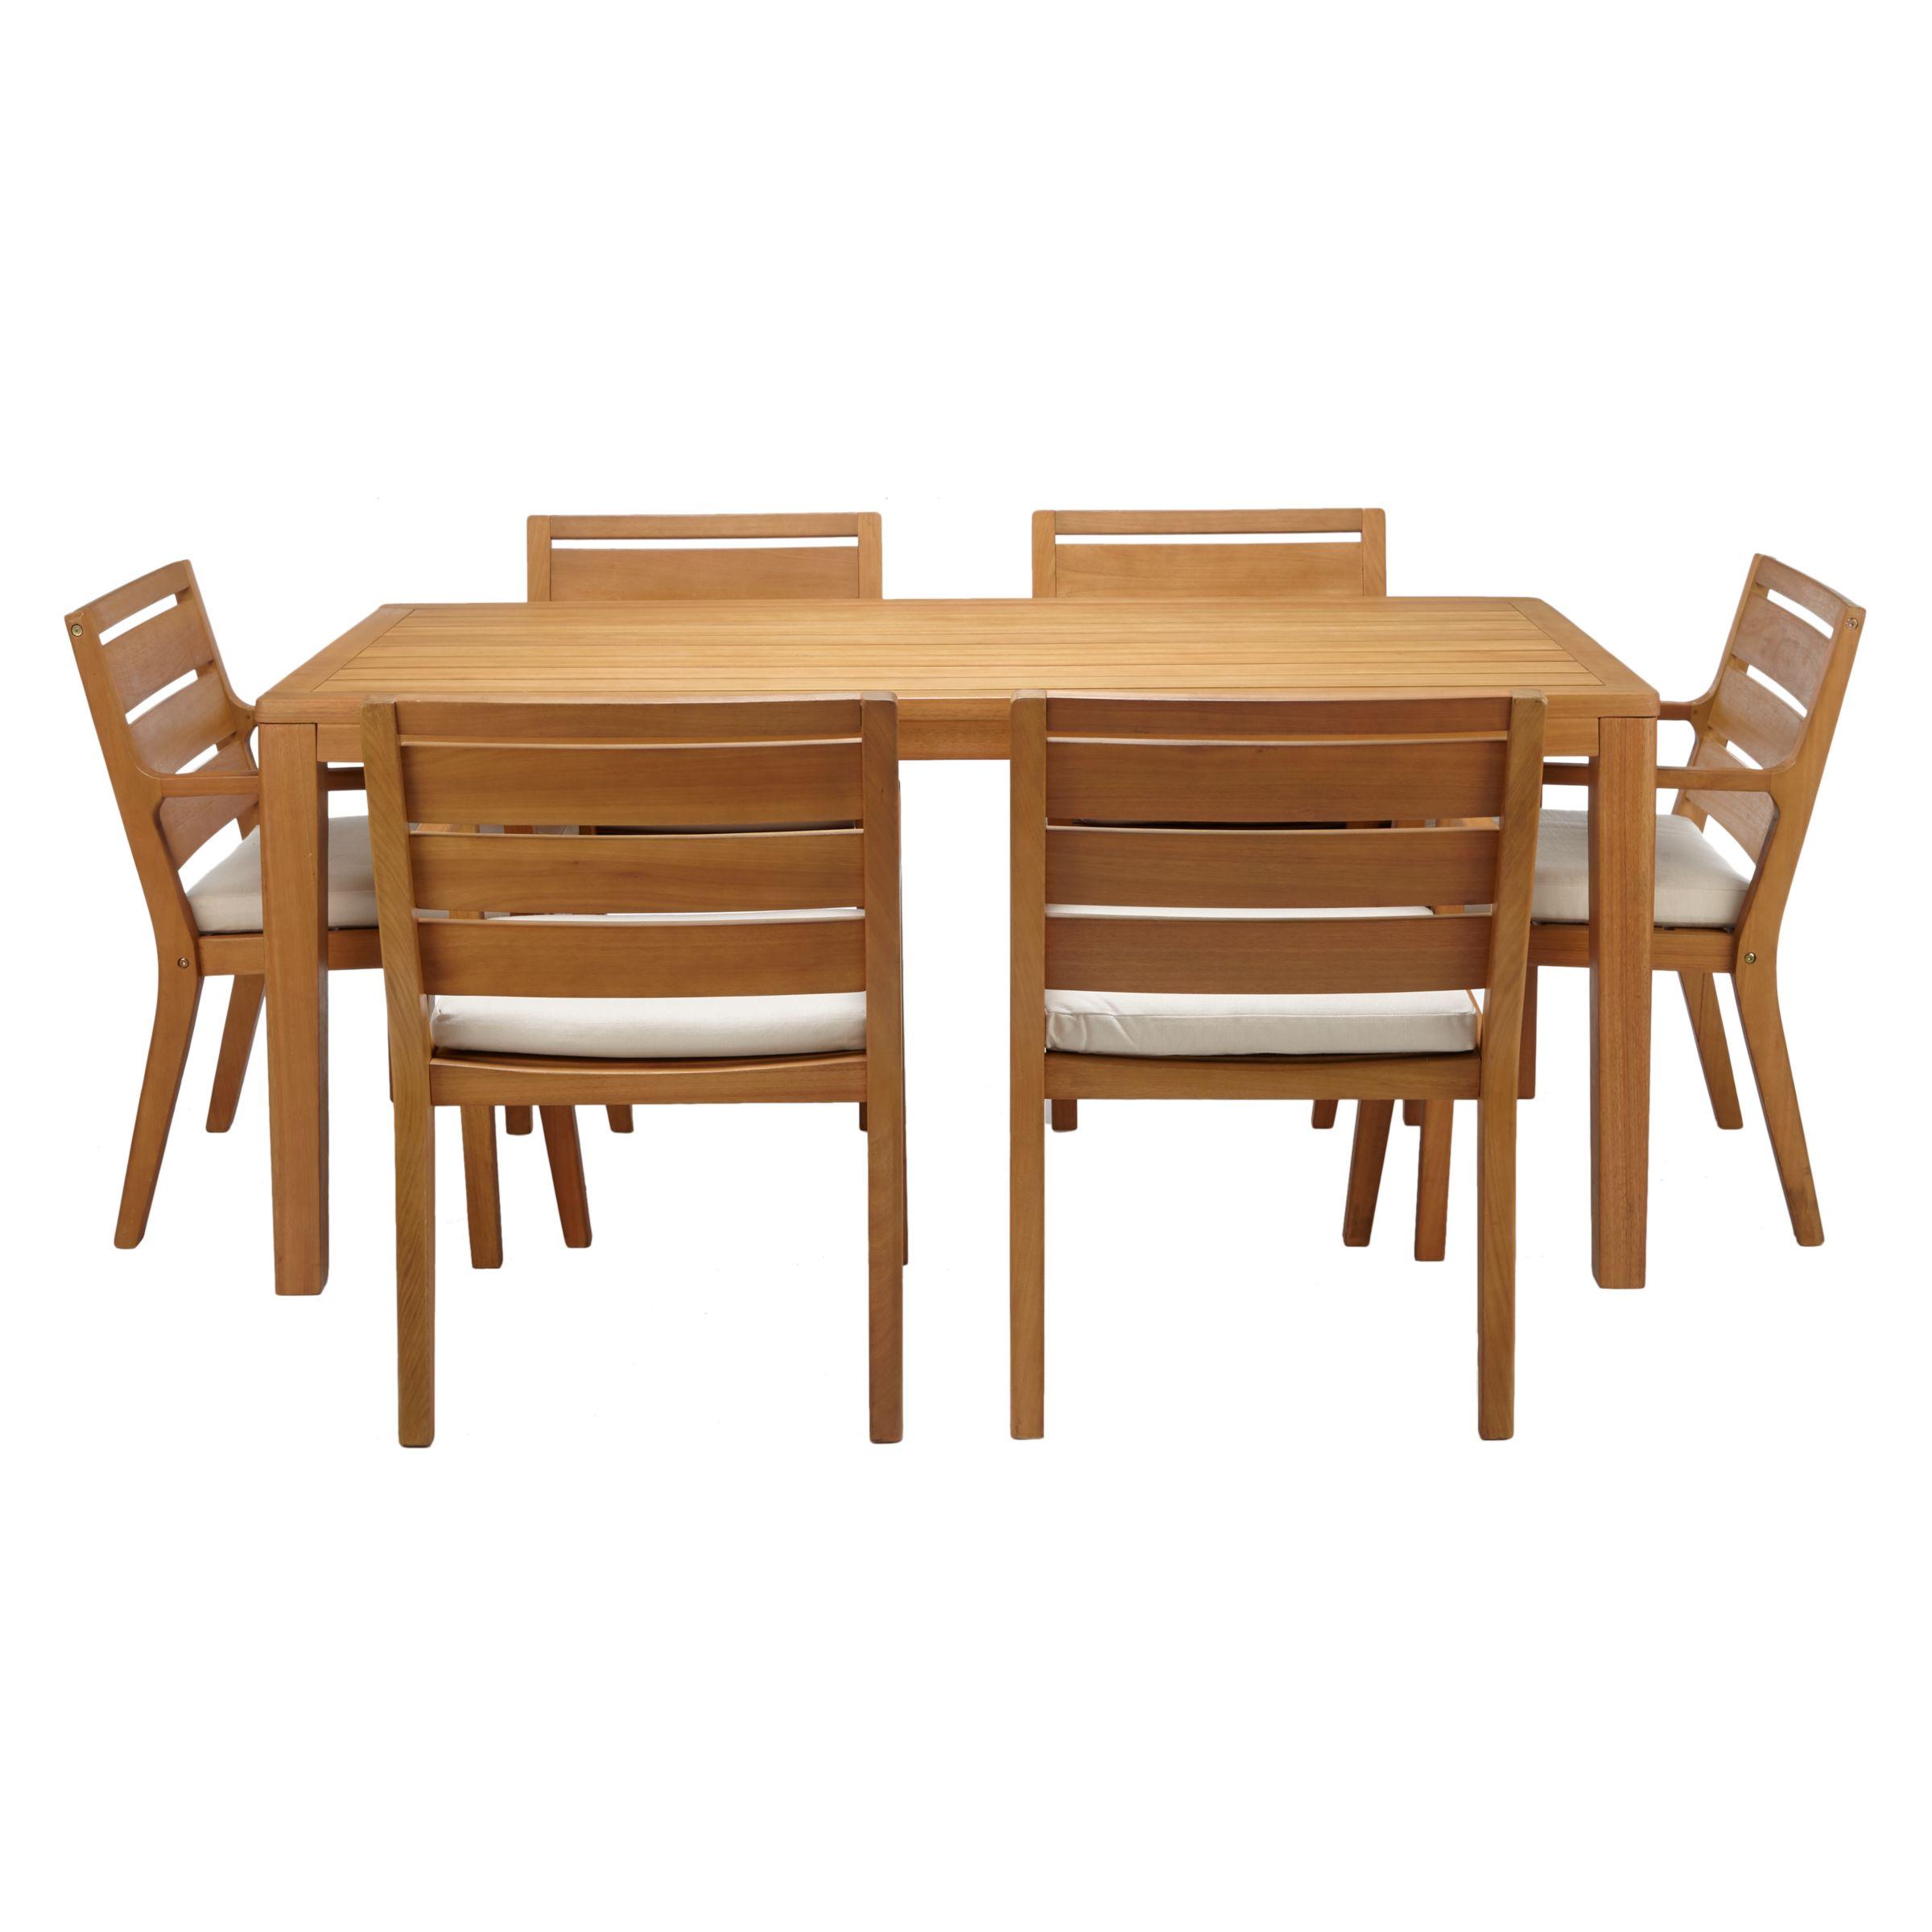 John Lewis & Partners Alta 9 Seat Garden Dining Table / Chairs Set,  FSC Certified Eucalyptus Wood, Natural